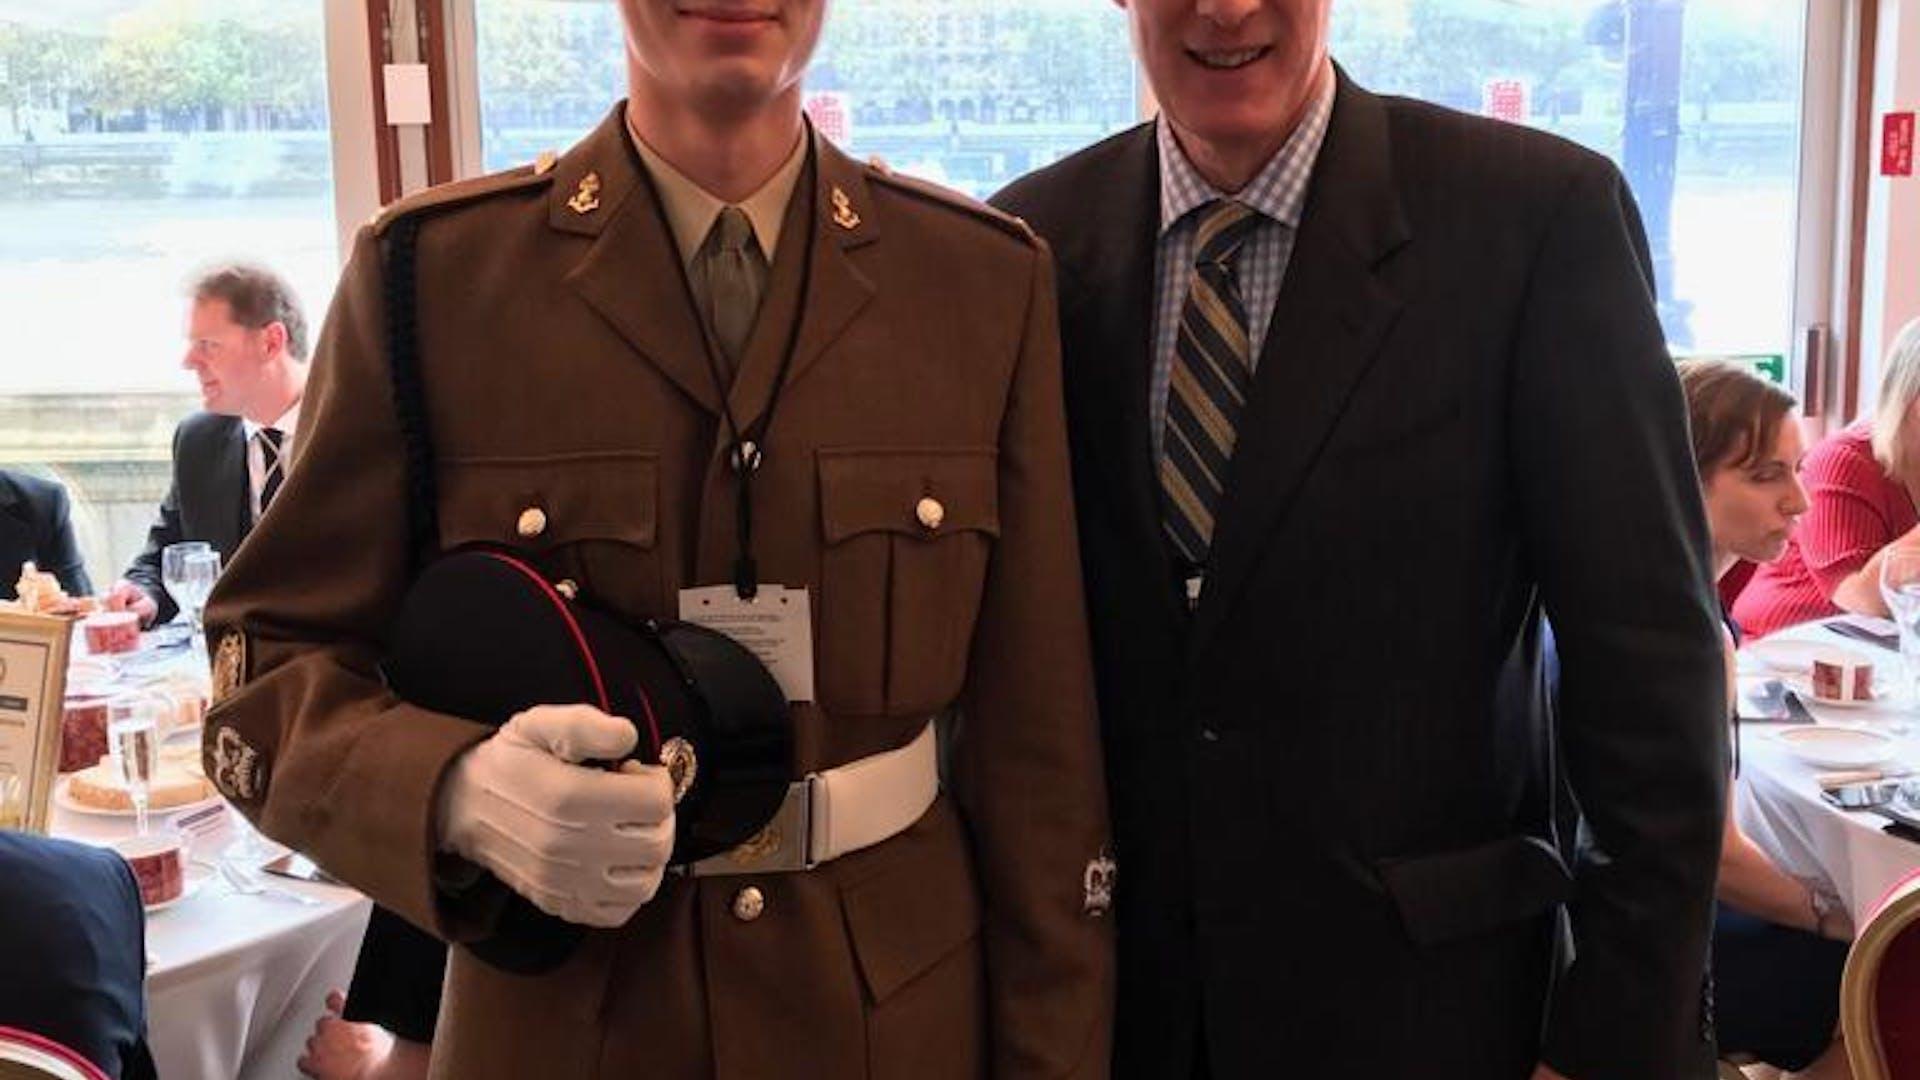 Ben and Colonel Stuart